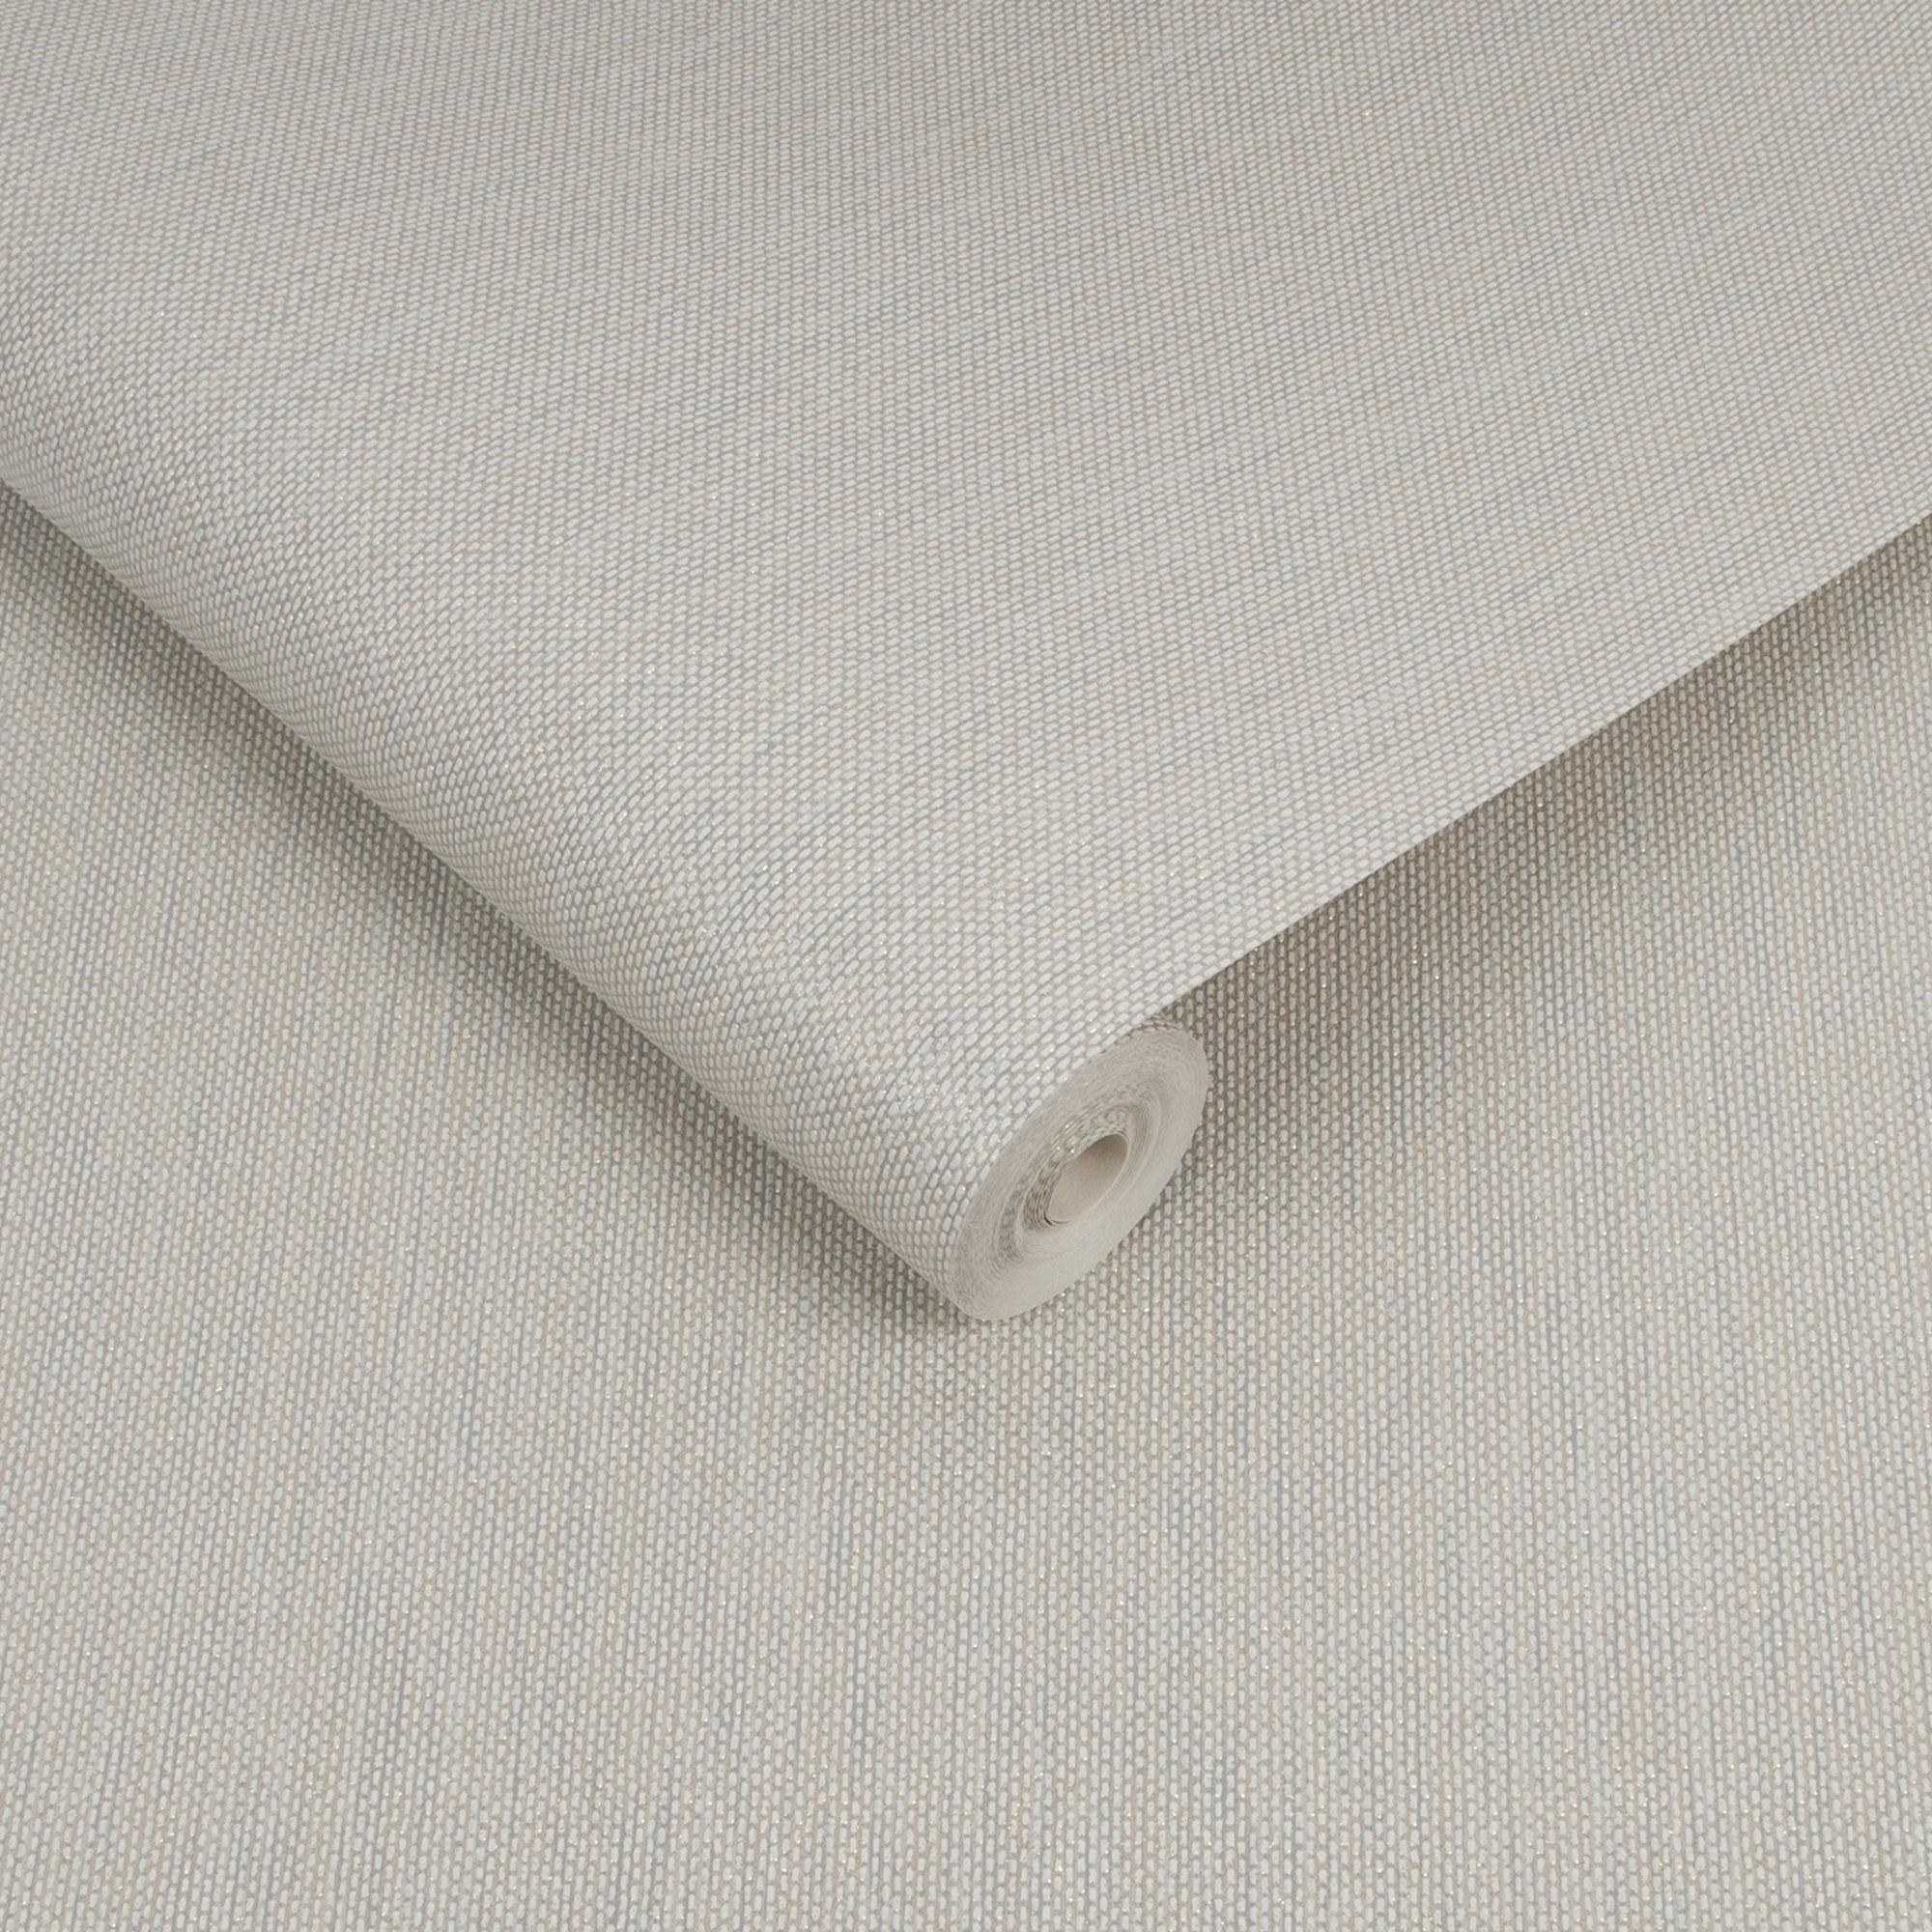 Superfresco Aaron Sparkle Taupe Textured Vinyl Glitter Faux Non Woven Fabric Wallpaper 112014